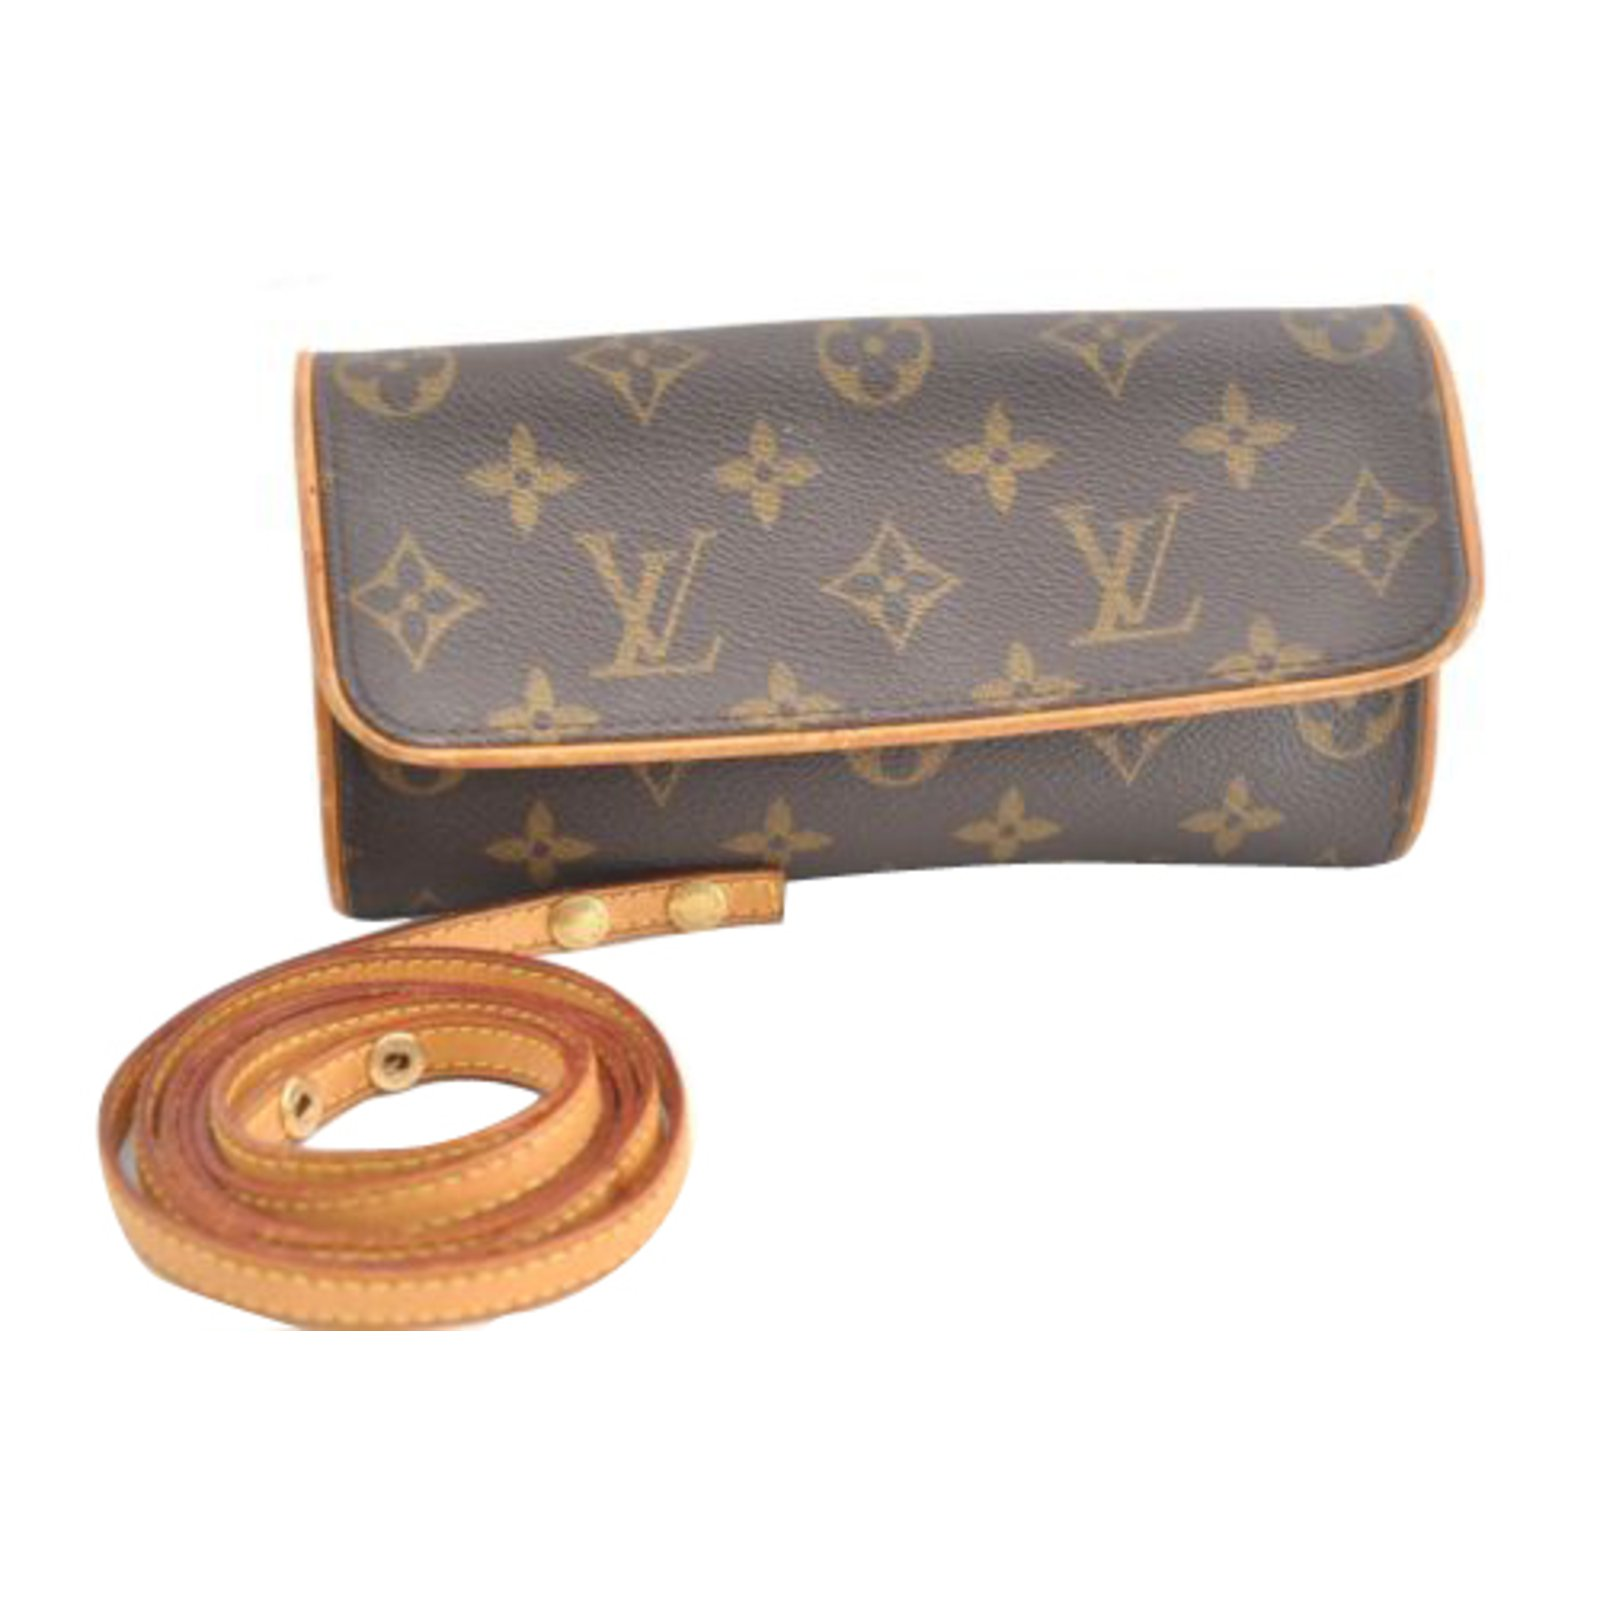 Louis Vuitton Twin Pm Pouch Handbags Cloth Brown Ref 90849